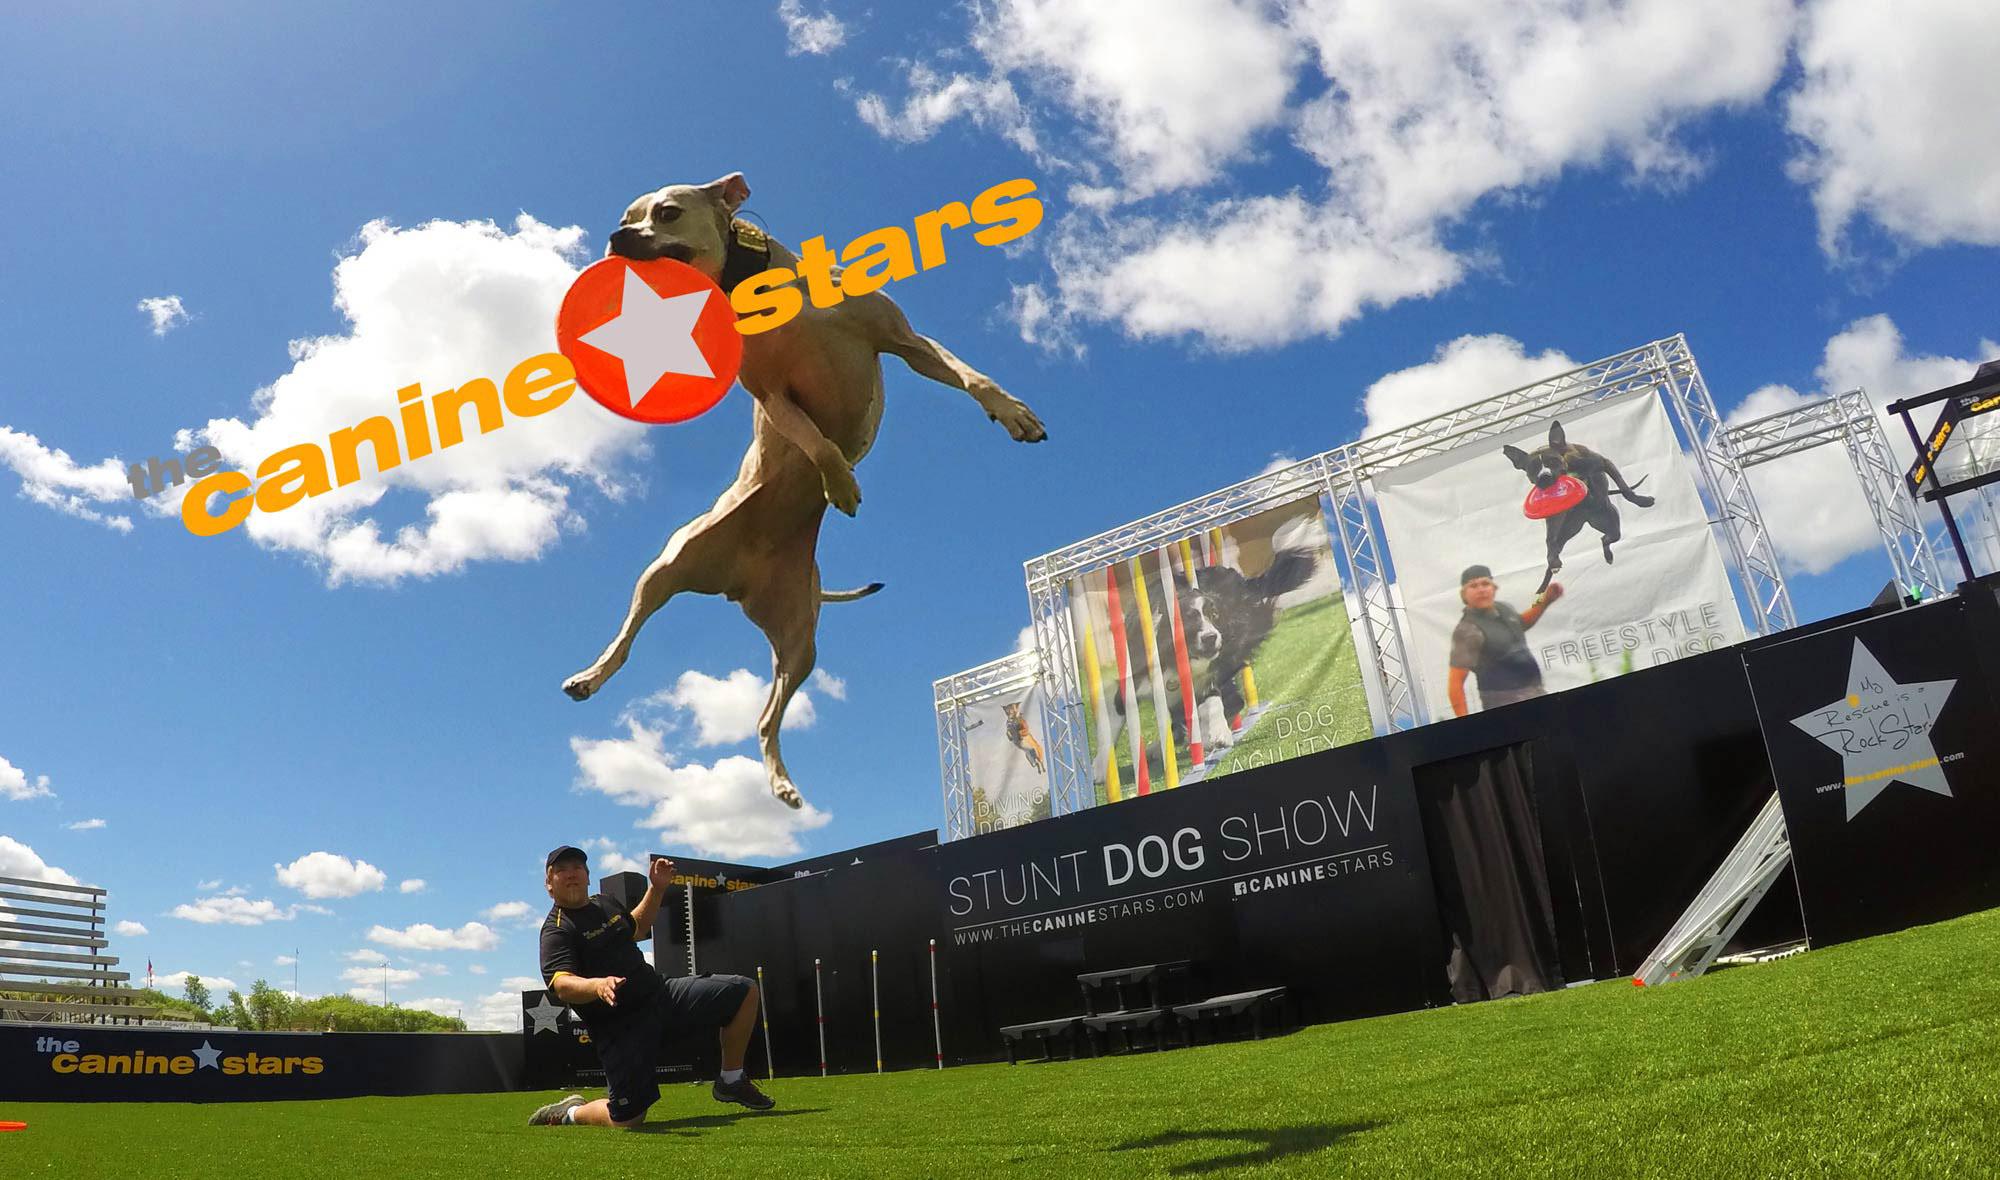 The Canine Stars Stunt Dog Show